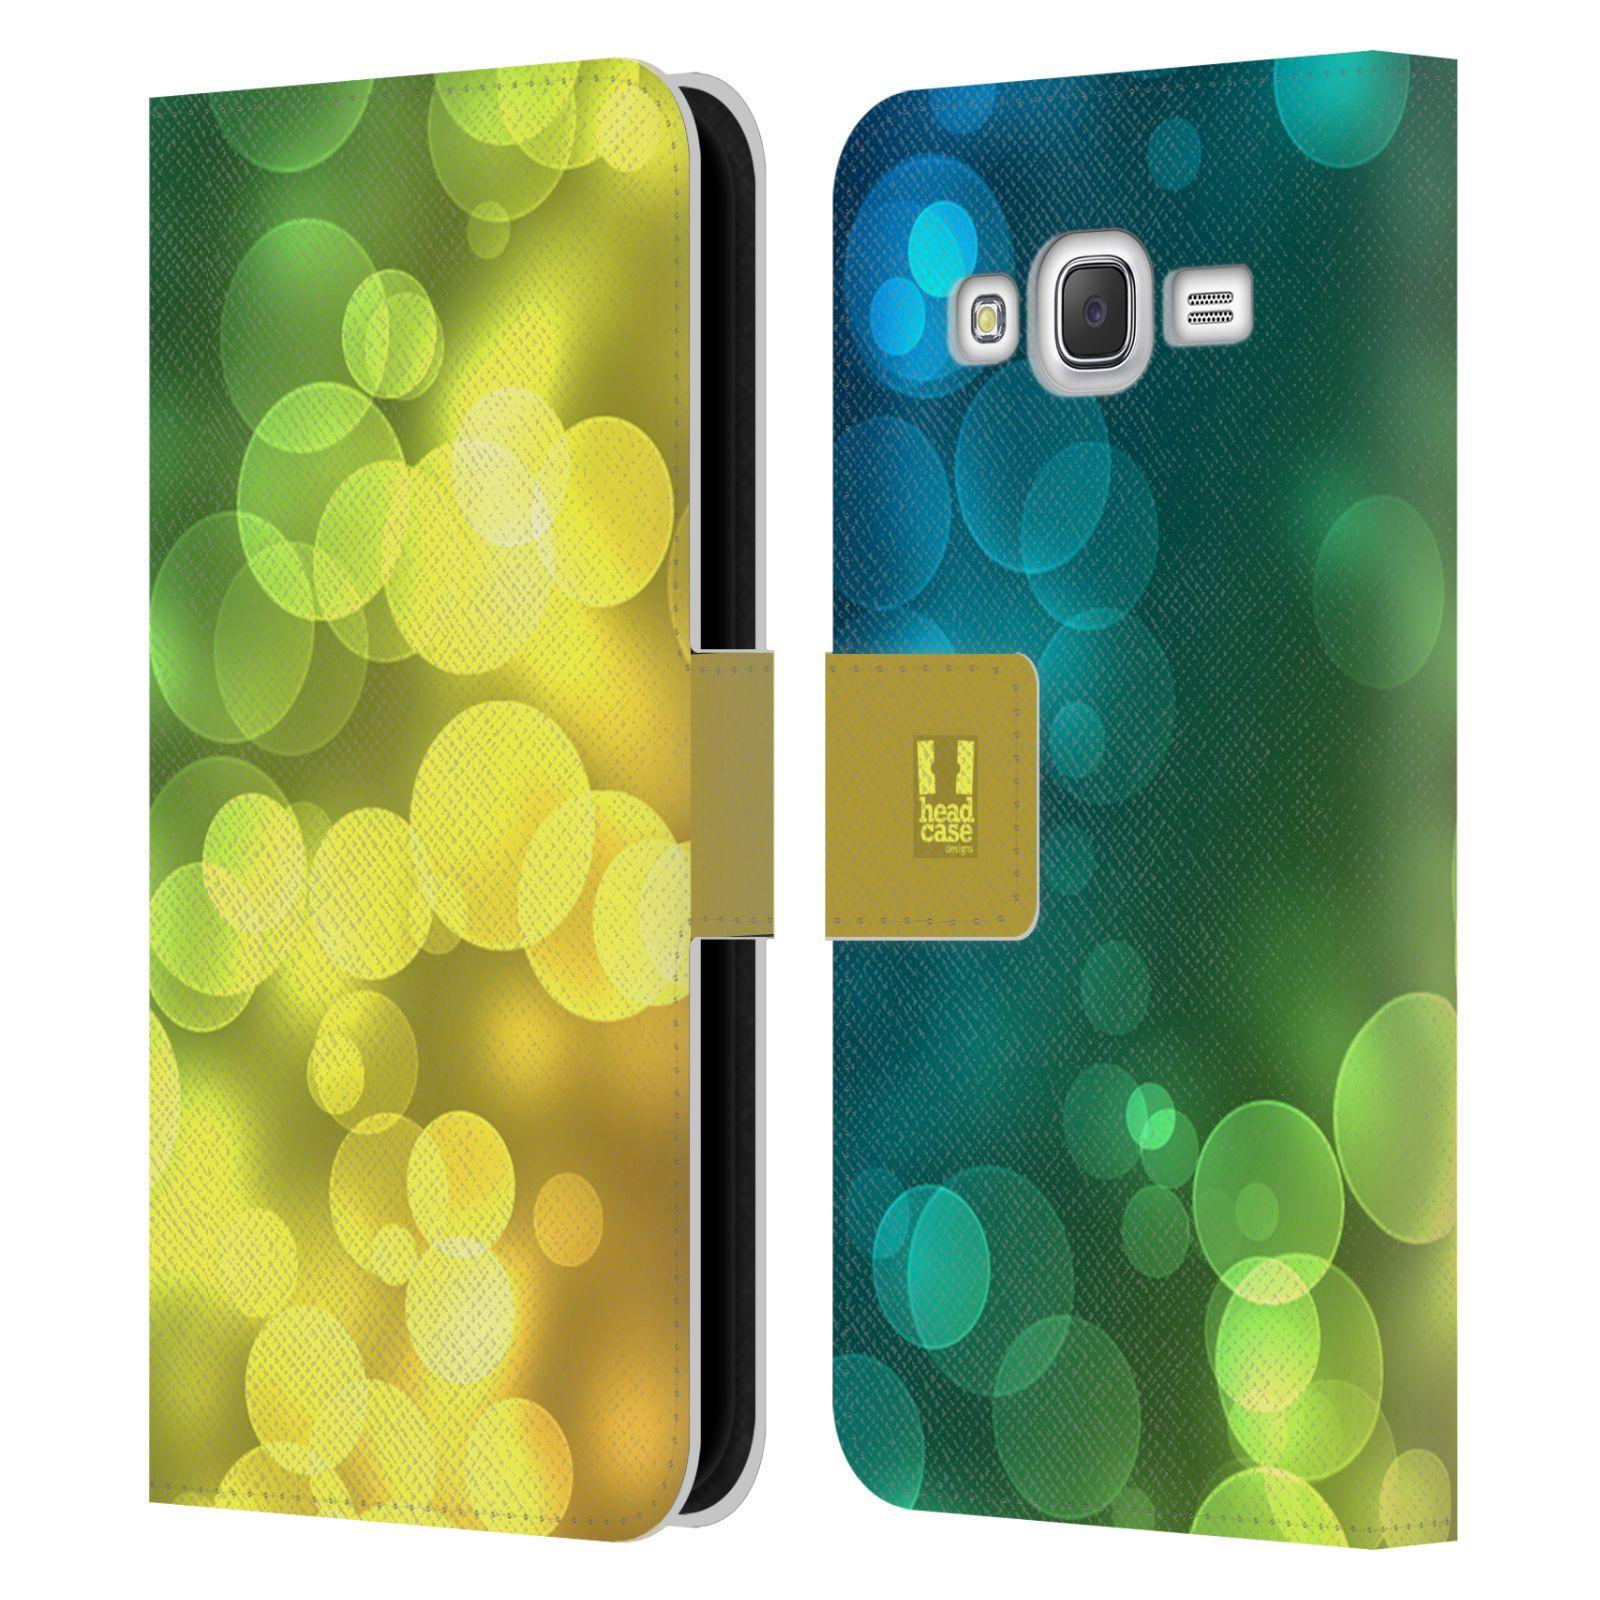 HEAD CASE Flipové pouzdro pro mobil Samsung Galaxy J5 (J500) / J5 DUOS BOKEH zářící vzor kruhy modrá a žlutá